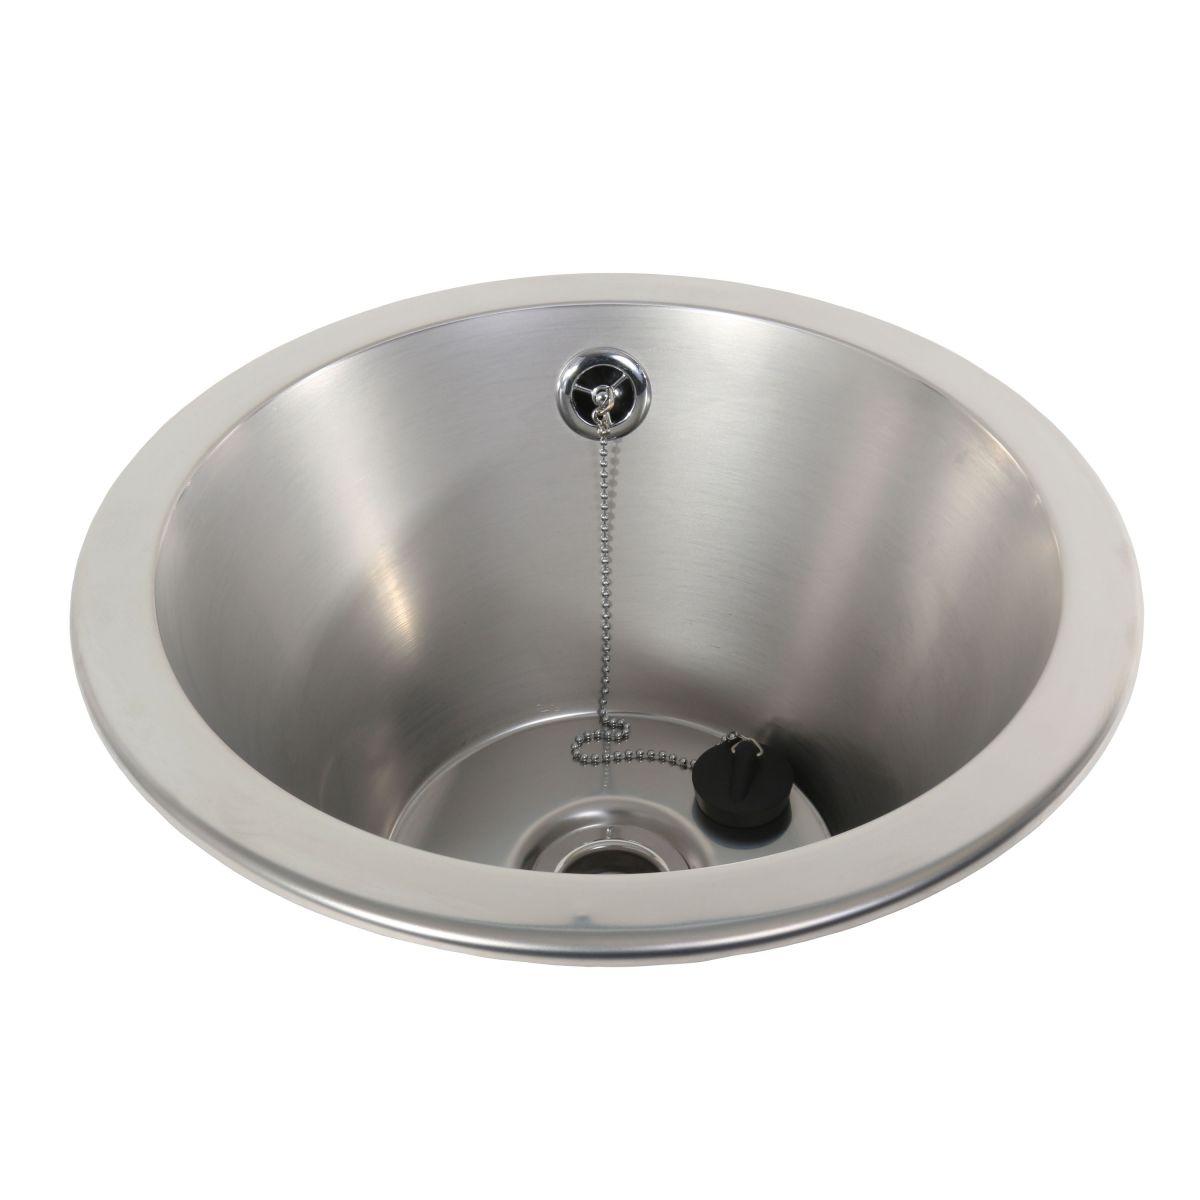 Inset Wash Bowl